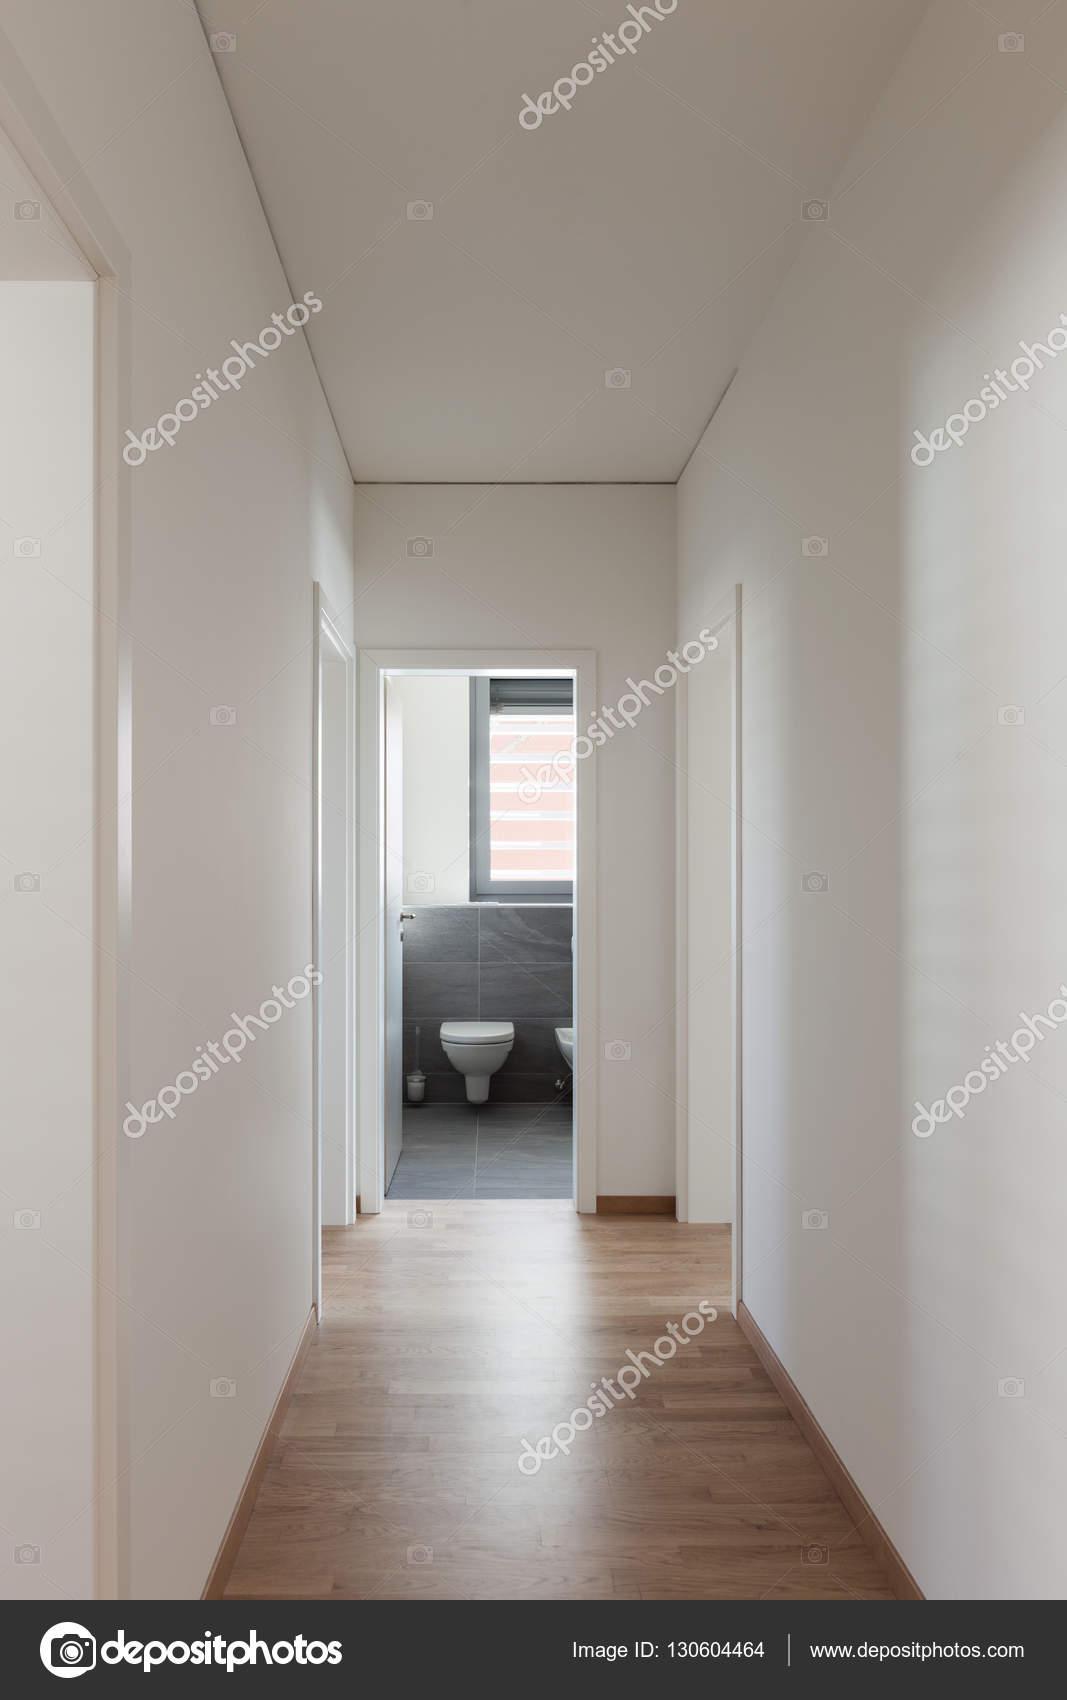 https://st3.depositphotos.com/2018053/13060/i/1600/depositphotos_130604464-stockafbeelding-interieur-hal-modern-huis.jpg